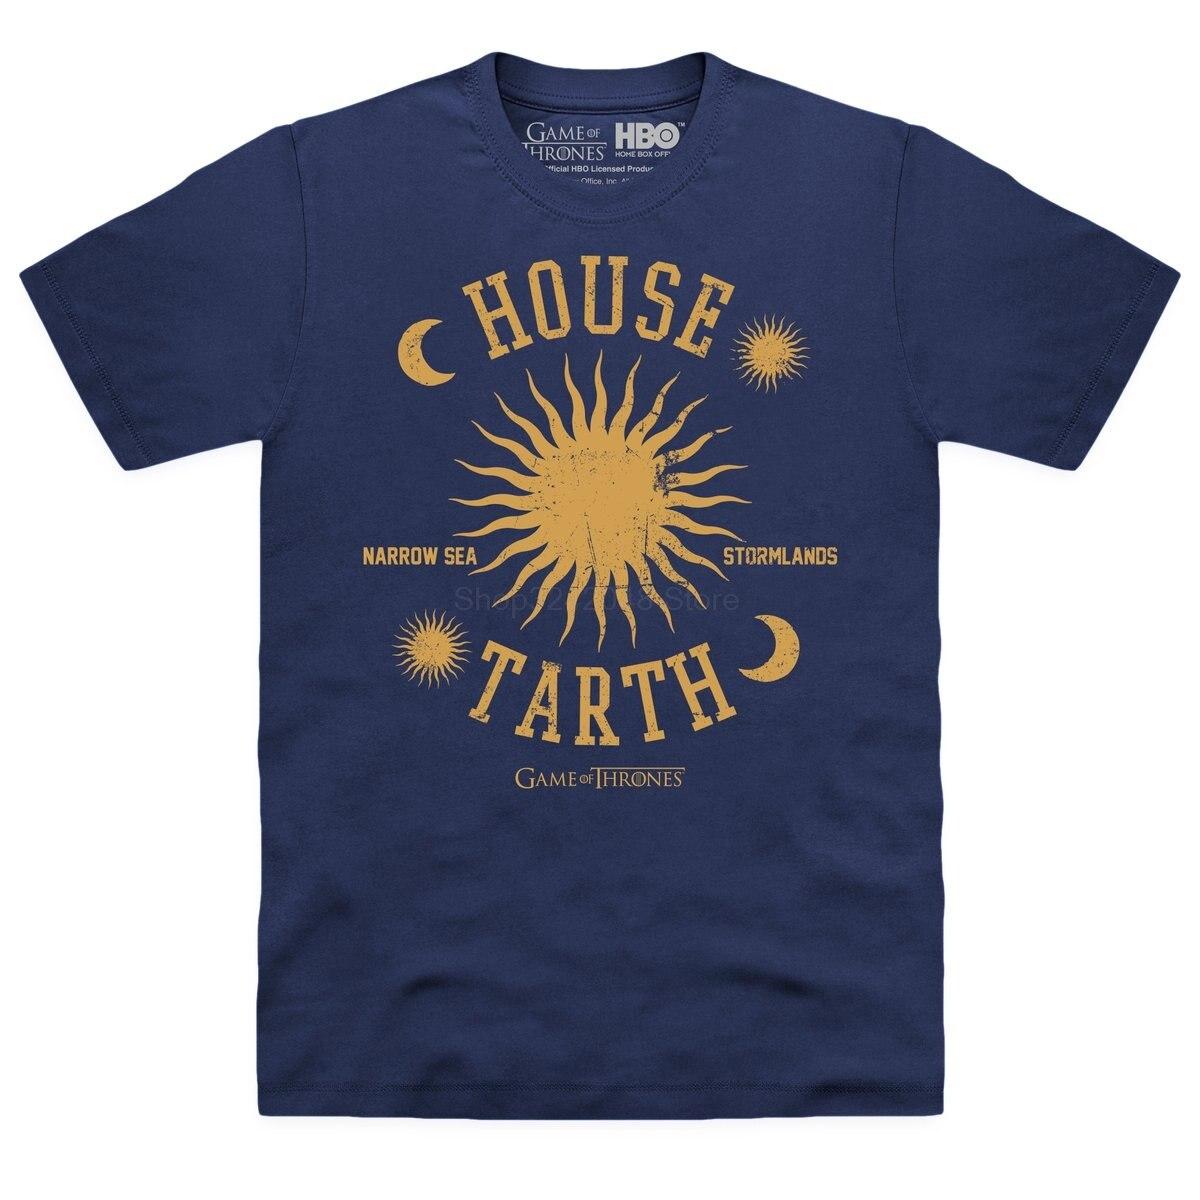 Gildan Brand Game Of Thrones - House Tarth T-Shirt 2019 Summer Short Sleeve T-Shirt